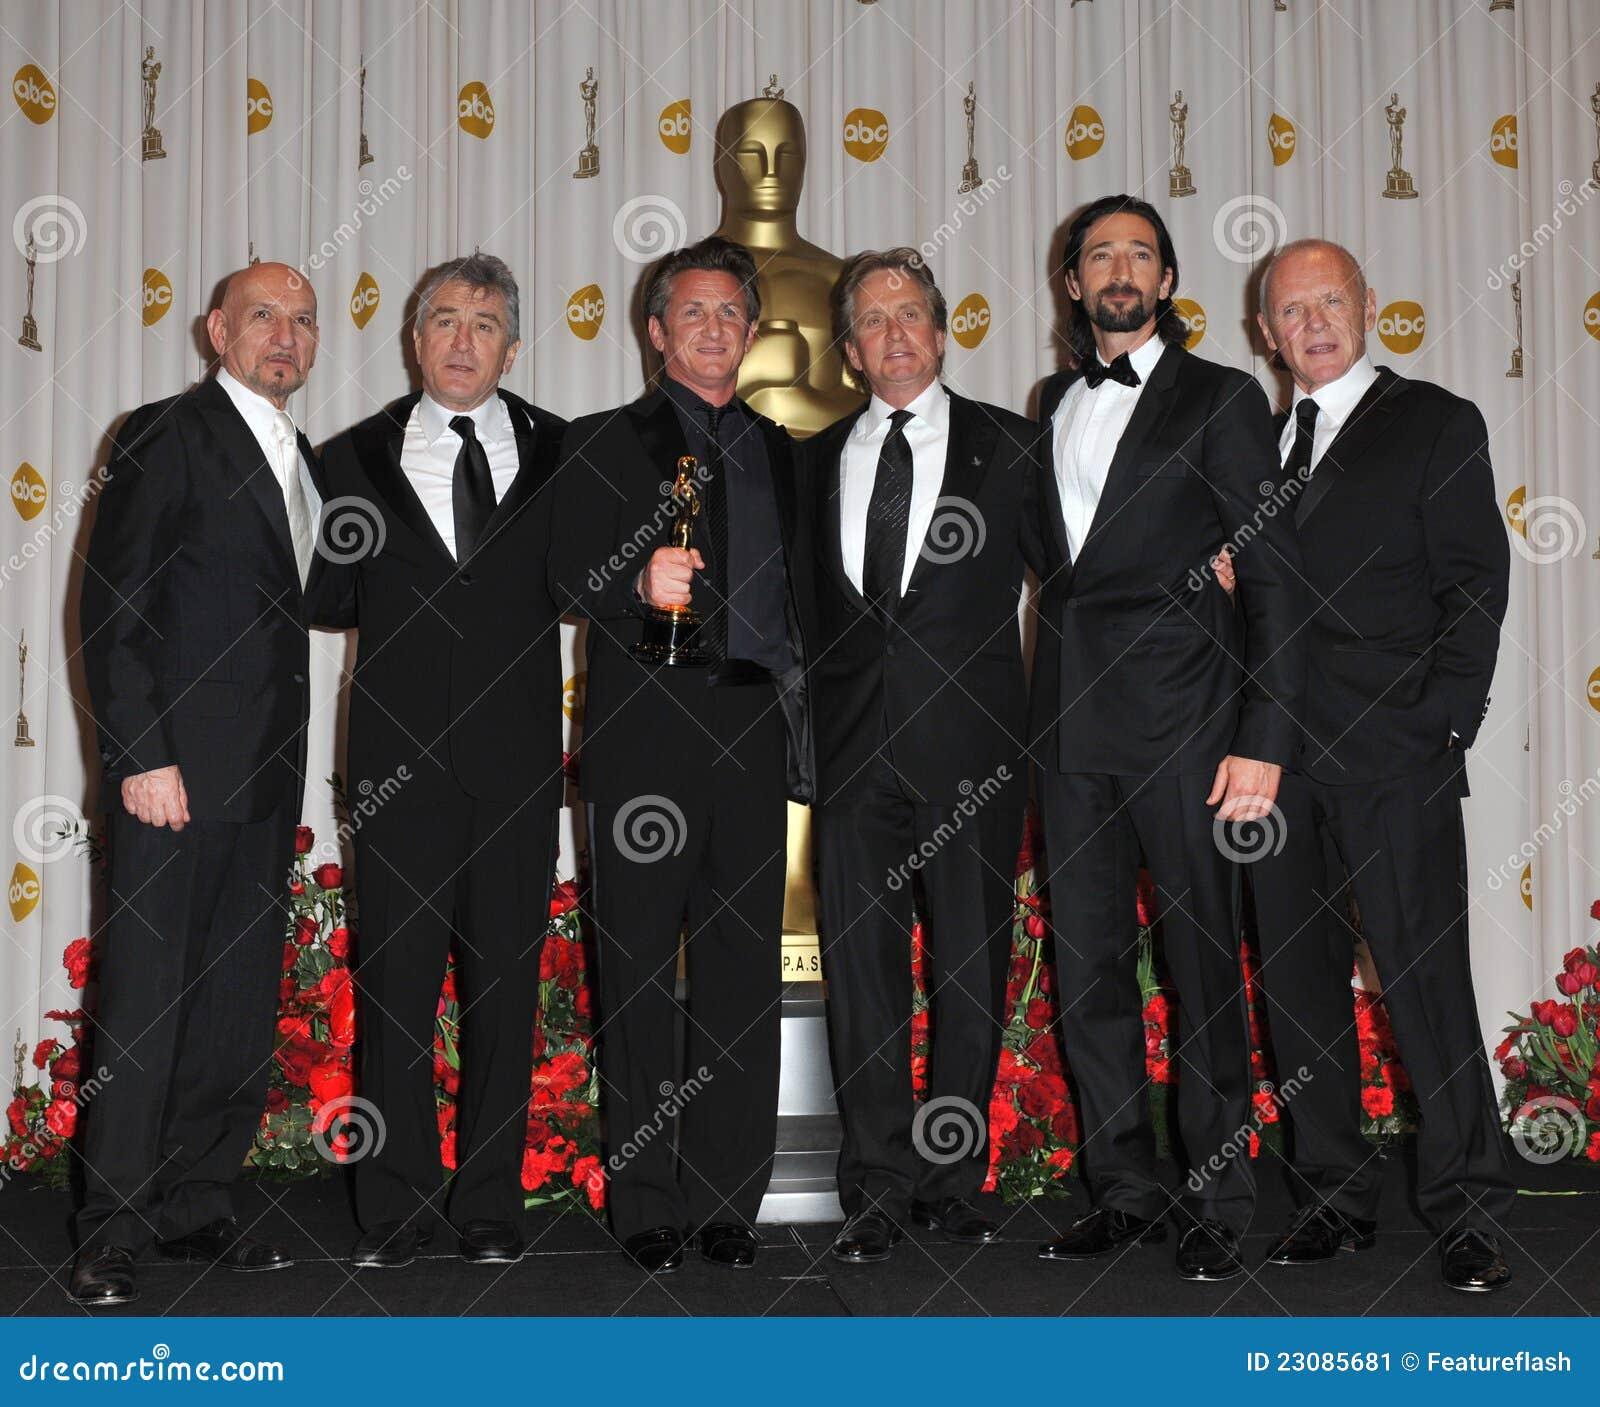 Ben Kingsley, Anthony Hopkins, Adrien Brody, Michael Douglas, Robert De Niro, Sean Penn